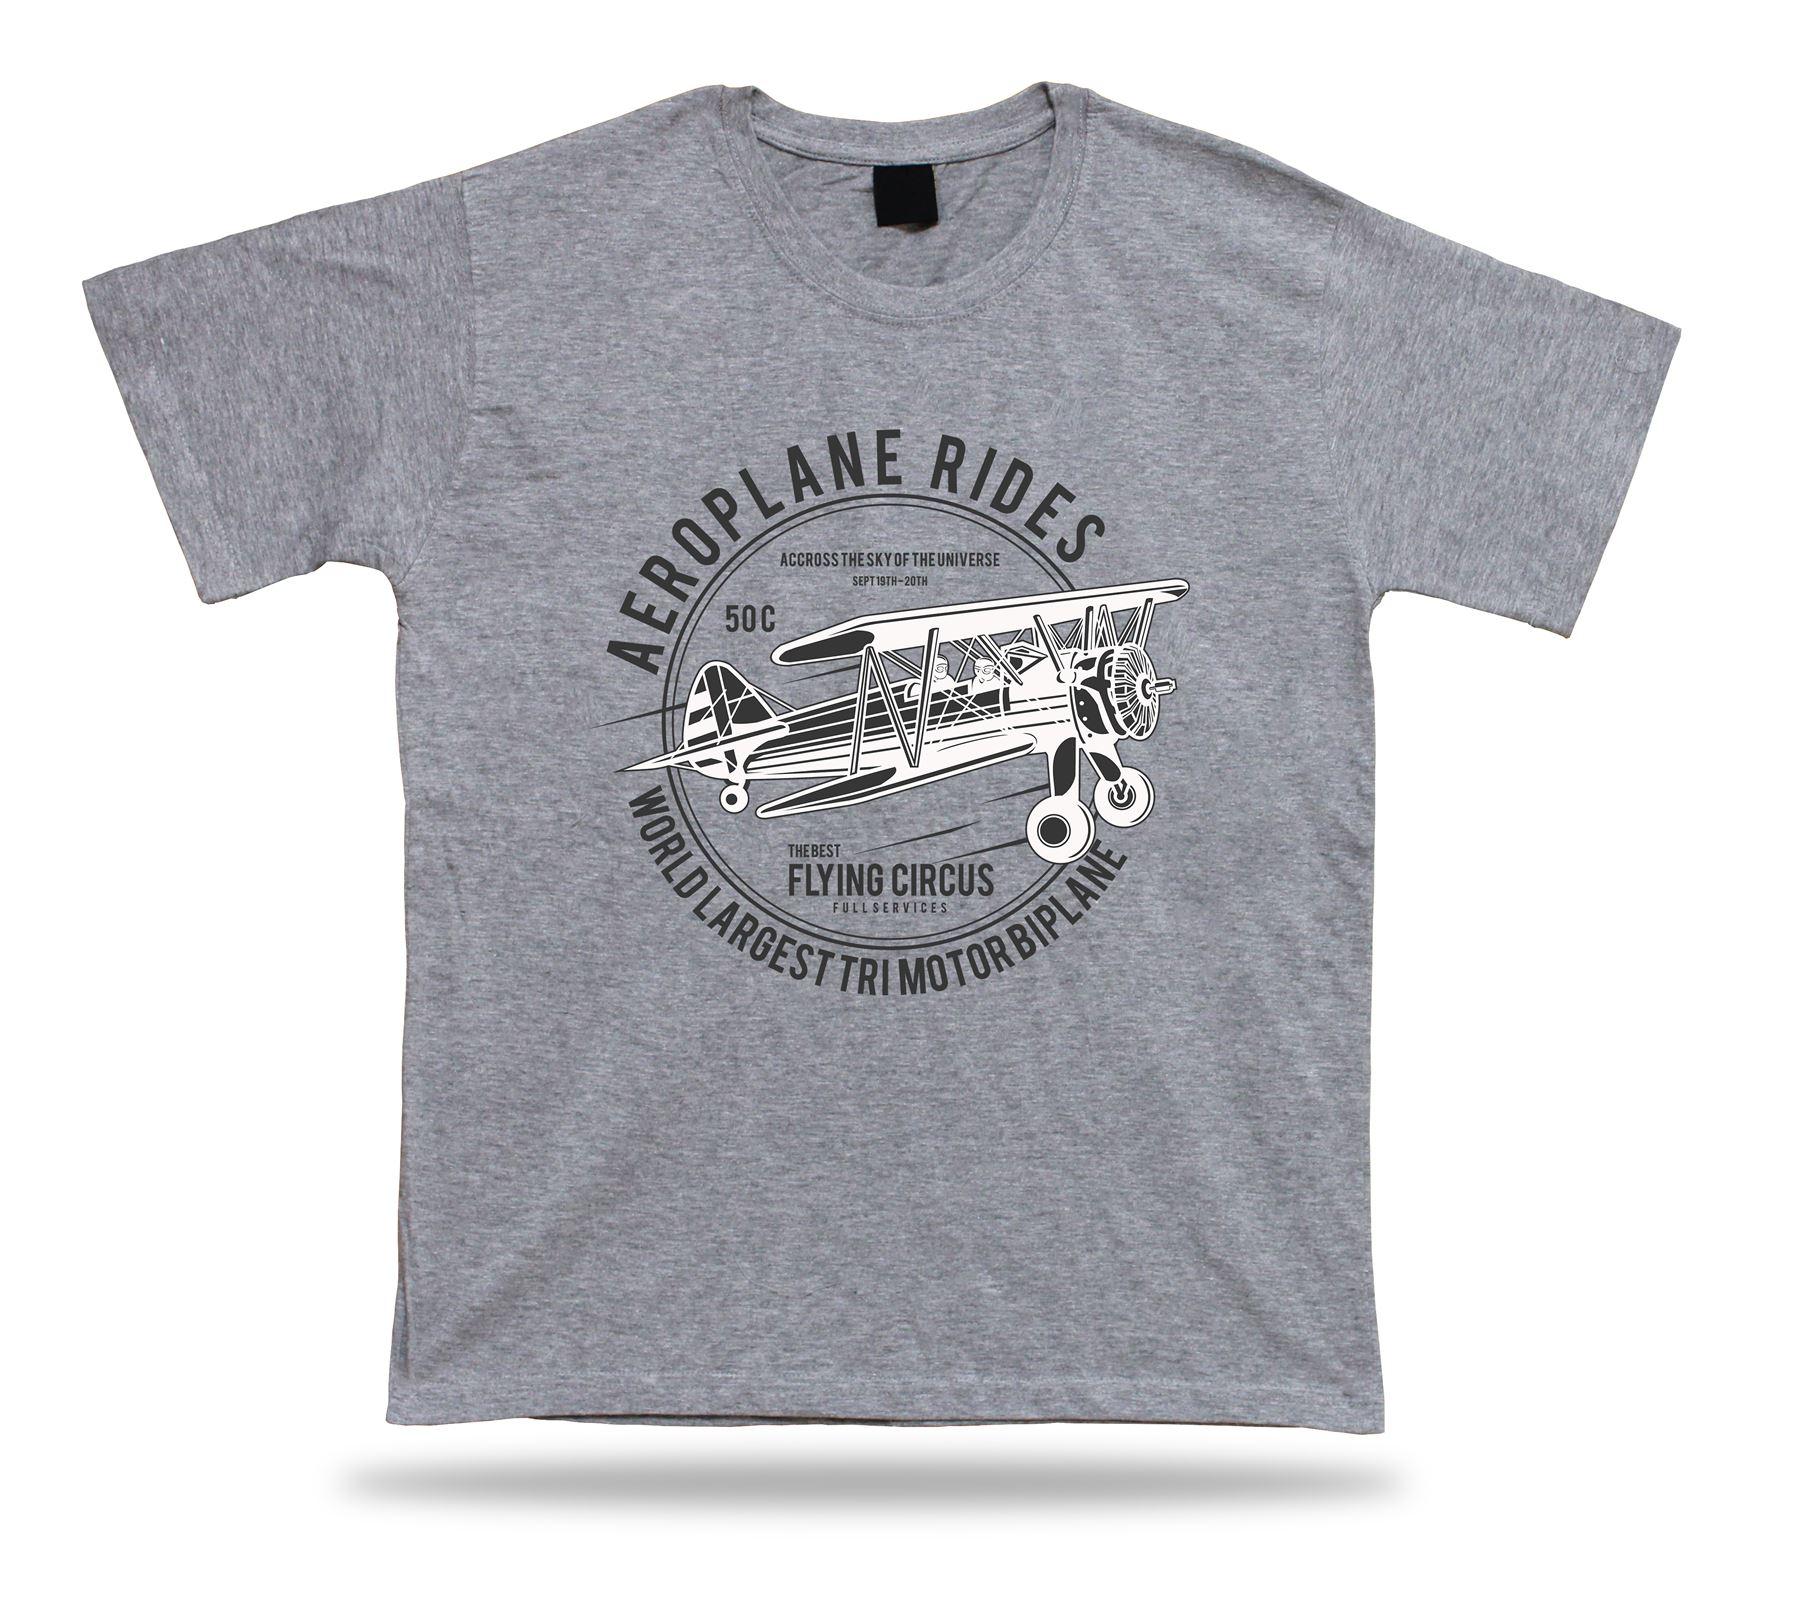 Aeroplane Rides The best flying circus vintage t shirt tee modern design gift